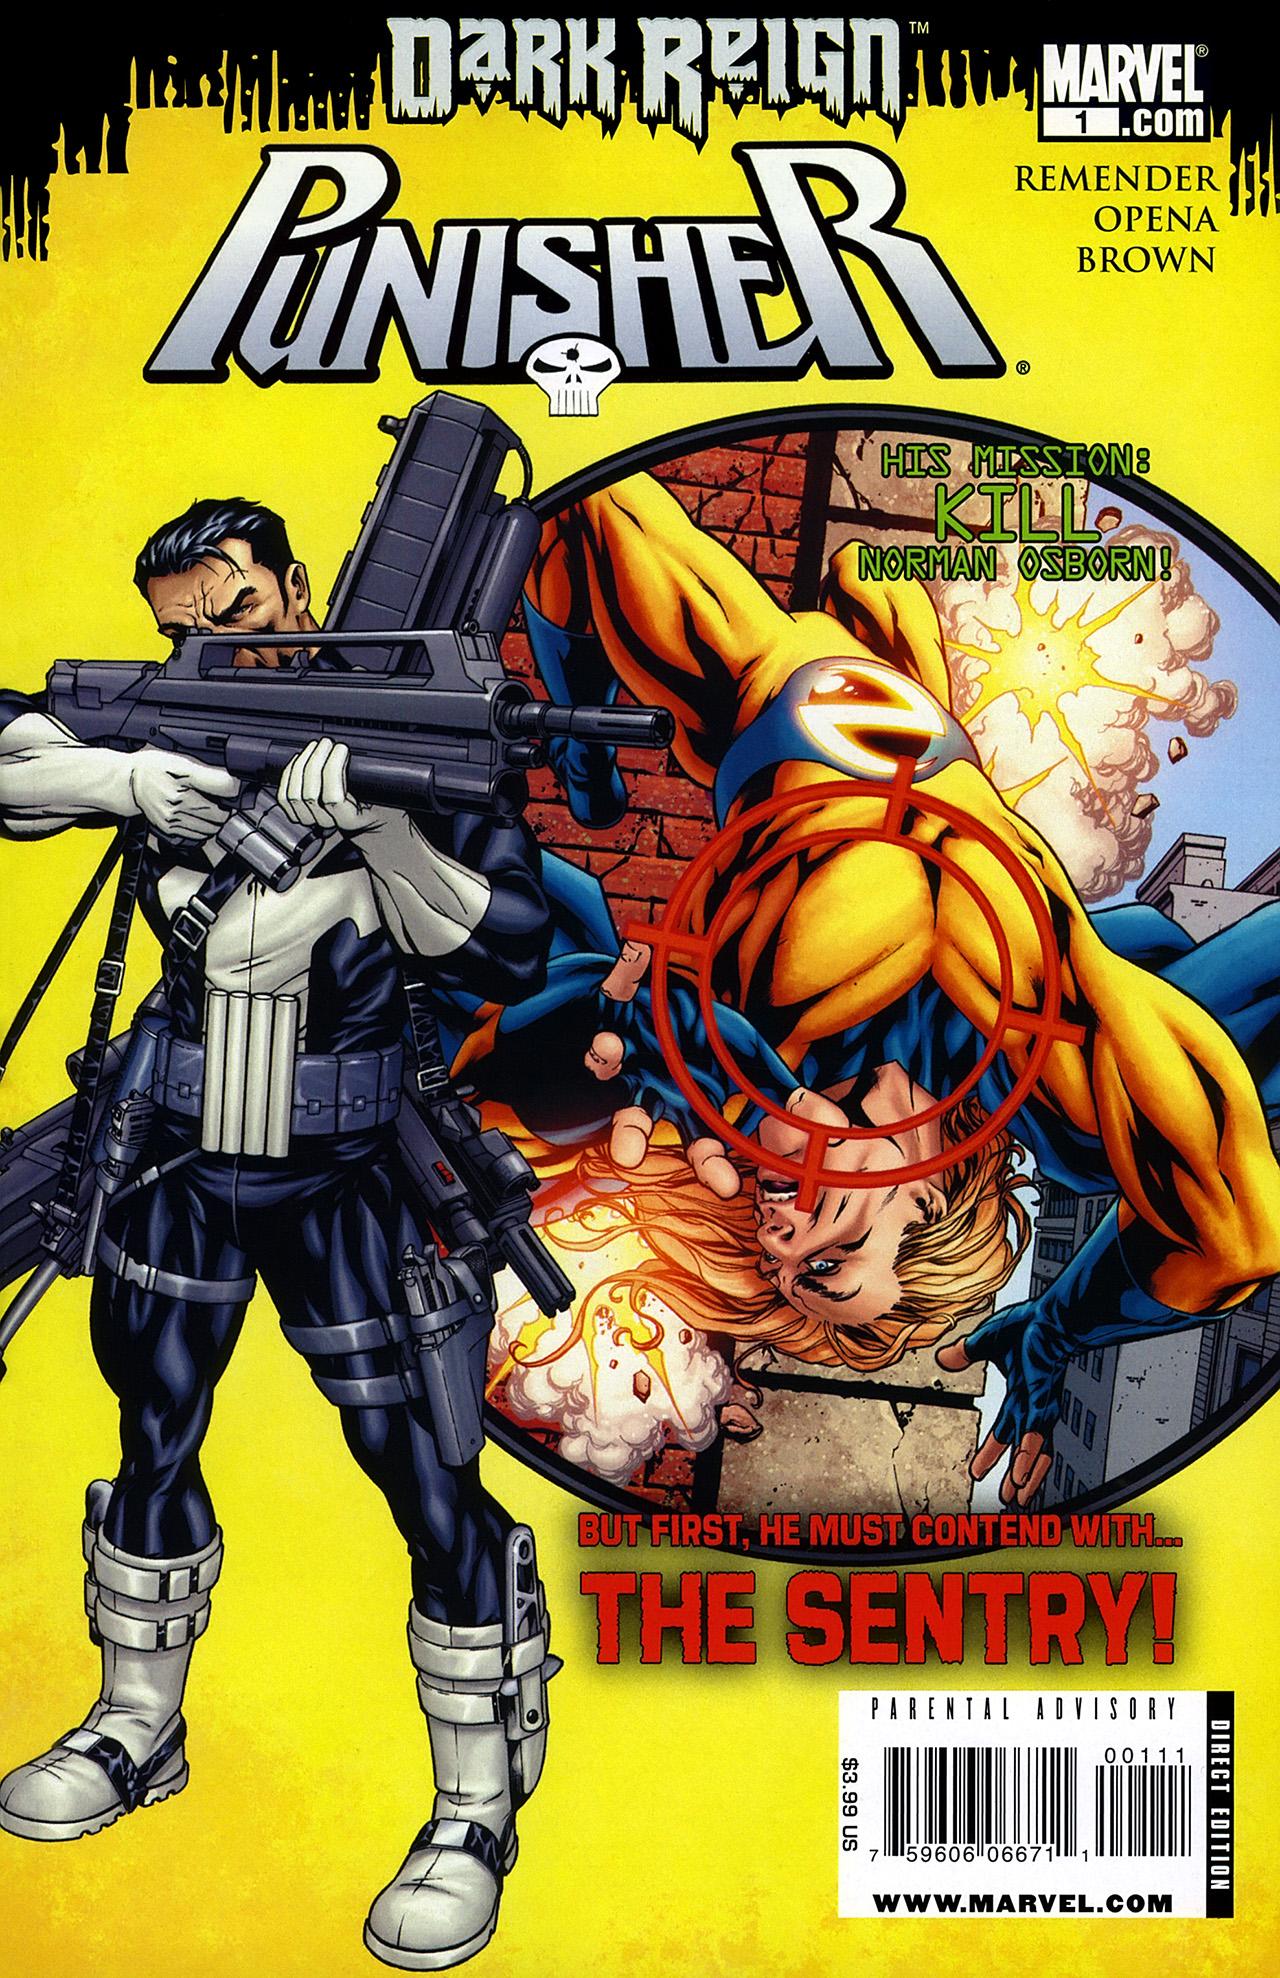 Final Infinity War Thanos Nightwing Hulk Batman Deadpool Sentry Punisher Hawkeye